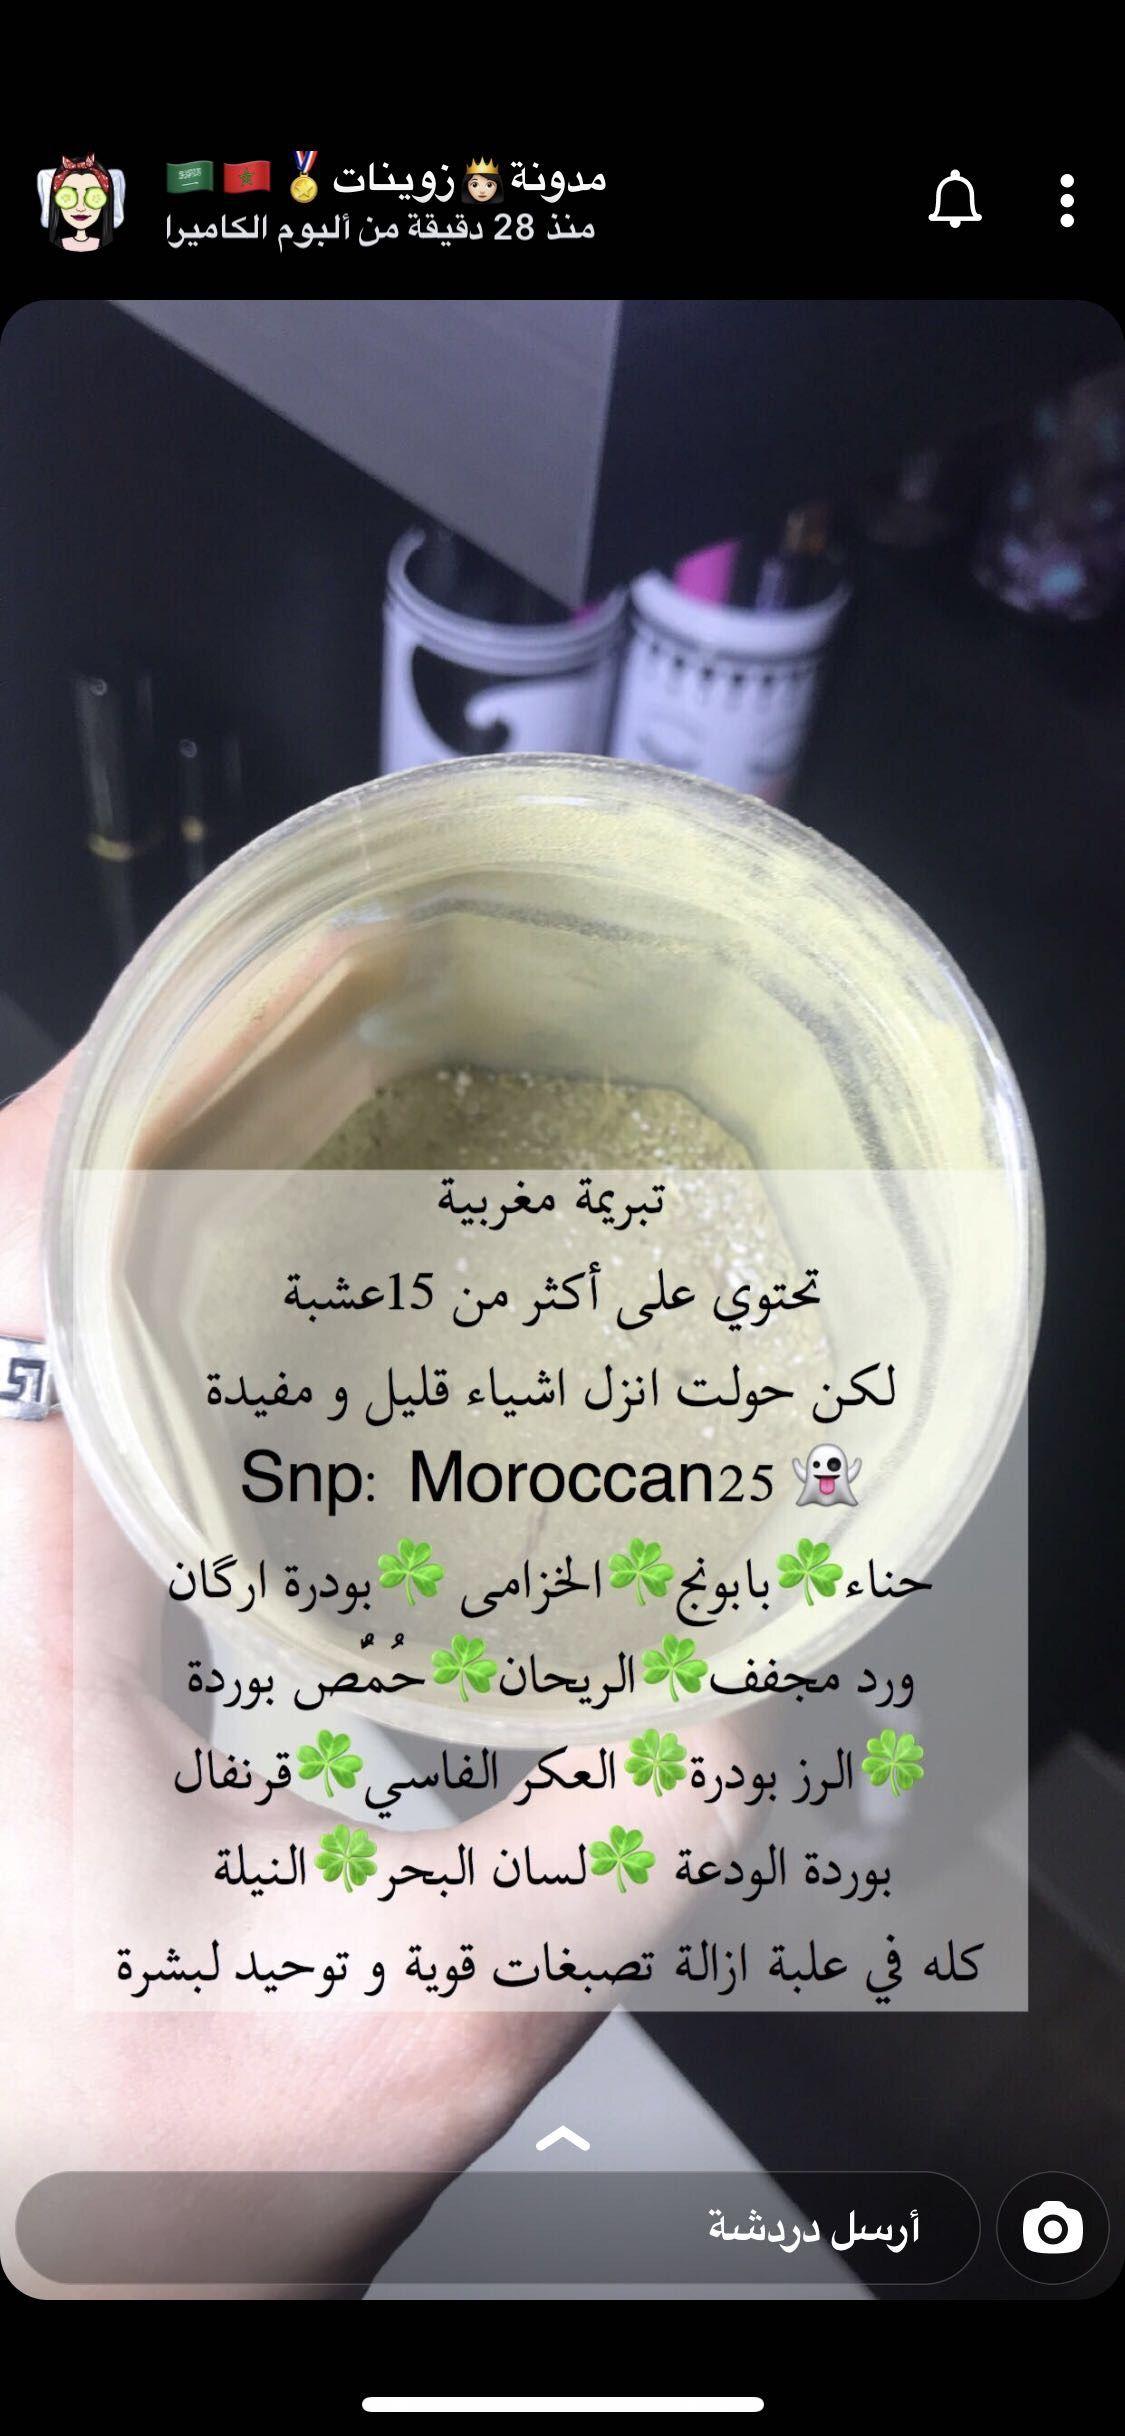 مرحبا بكم Inst Moroccan Zawinati Snp Moroccan25 Facial Skin Care Routine Beauty Skin Care Routine Skin Care Solutions